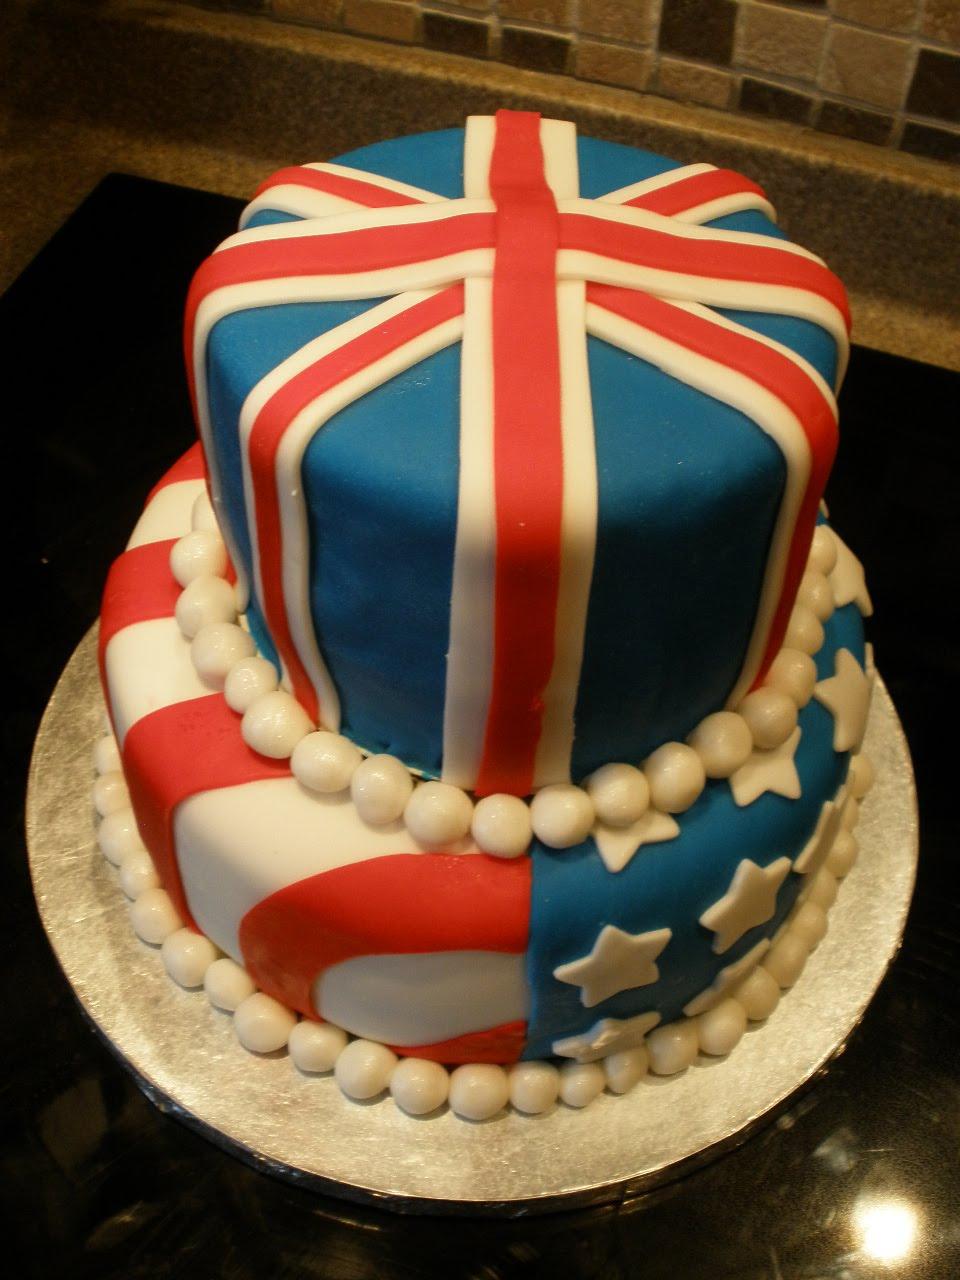 Cake Decorating Job In Uk : Liz Felgate Crafts: Celebrating 10 years living in the USA